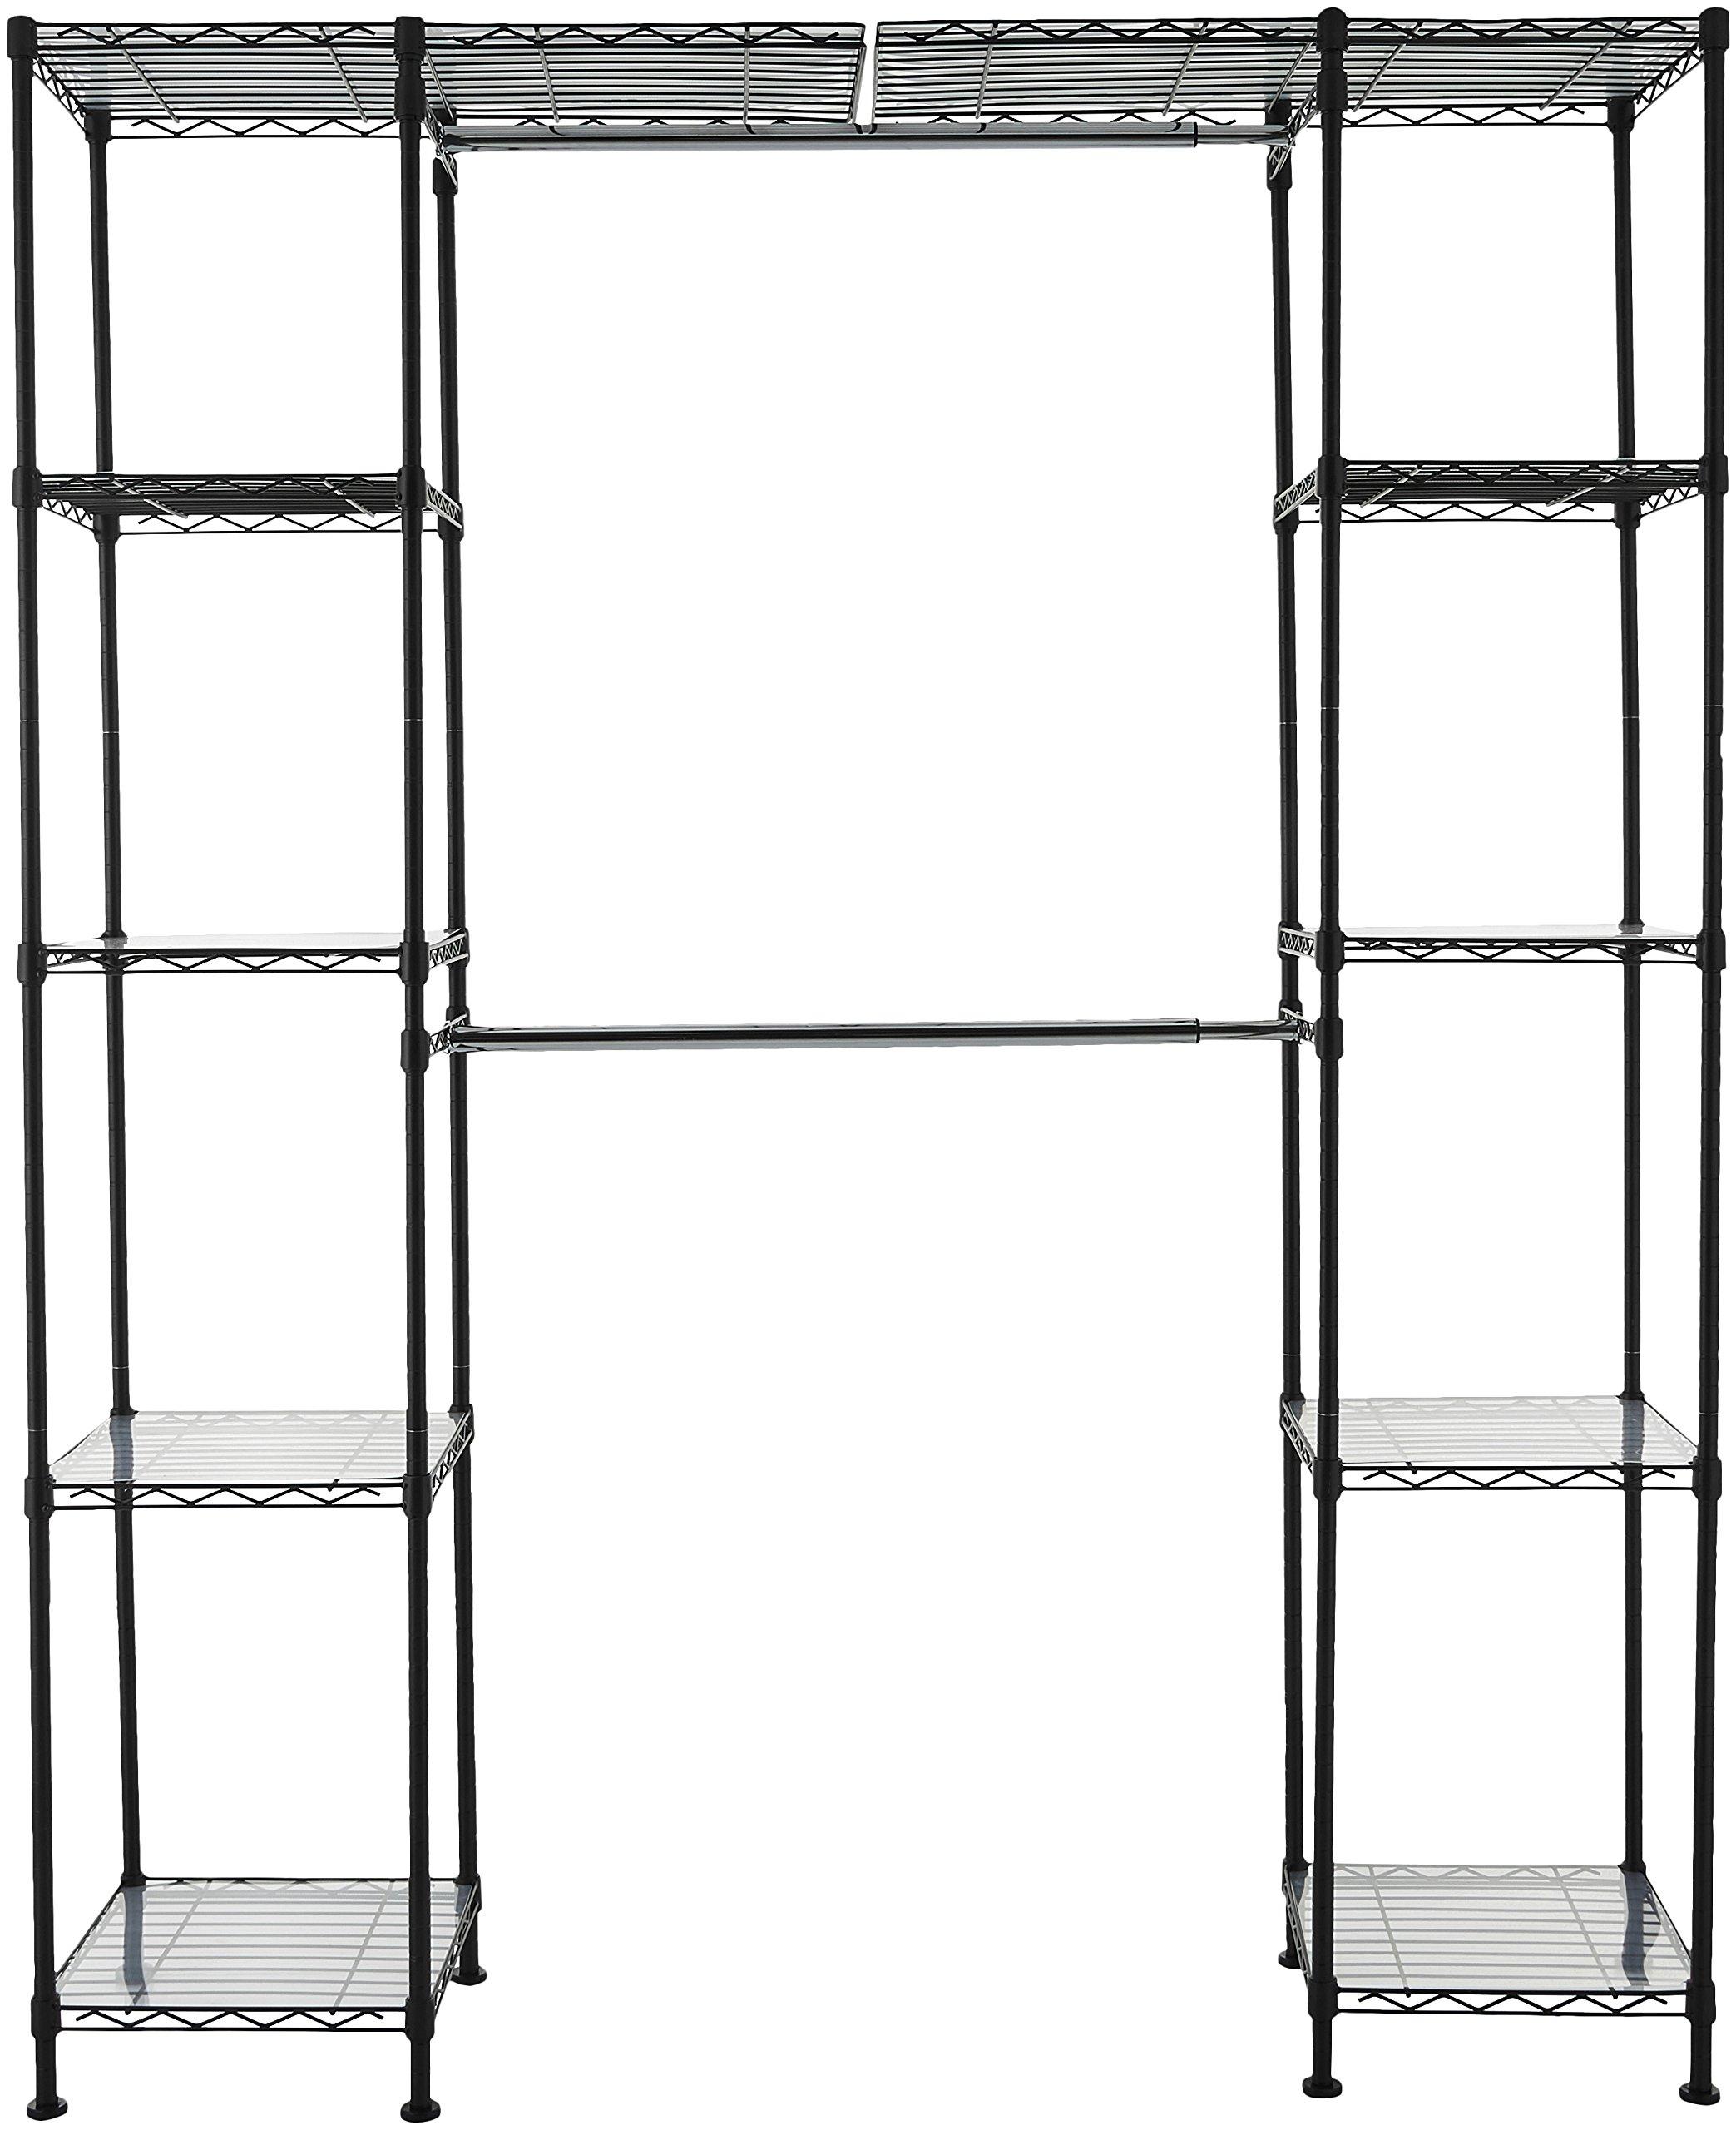 AmazonBasics Expandable Closet Organizer - 14'' x 58'' Expands to 63'' x 72'', Black